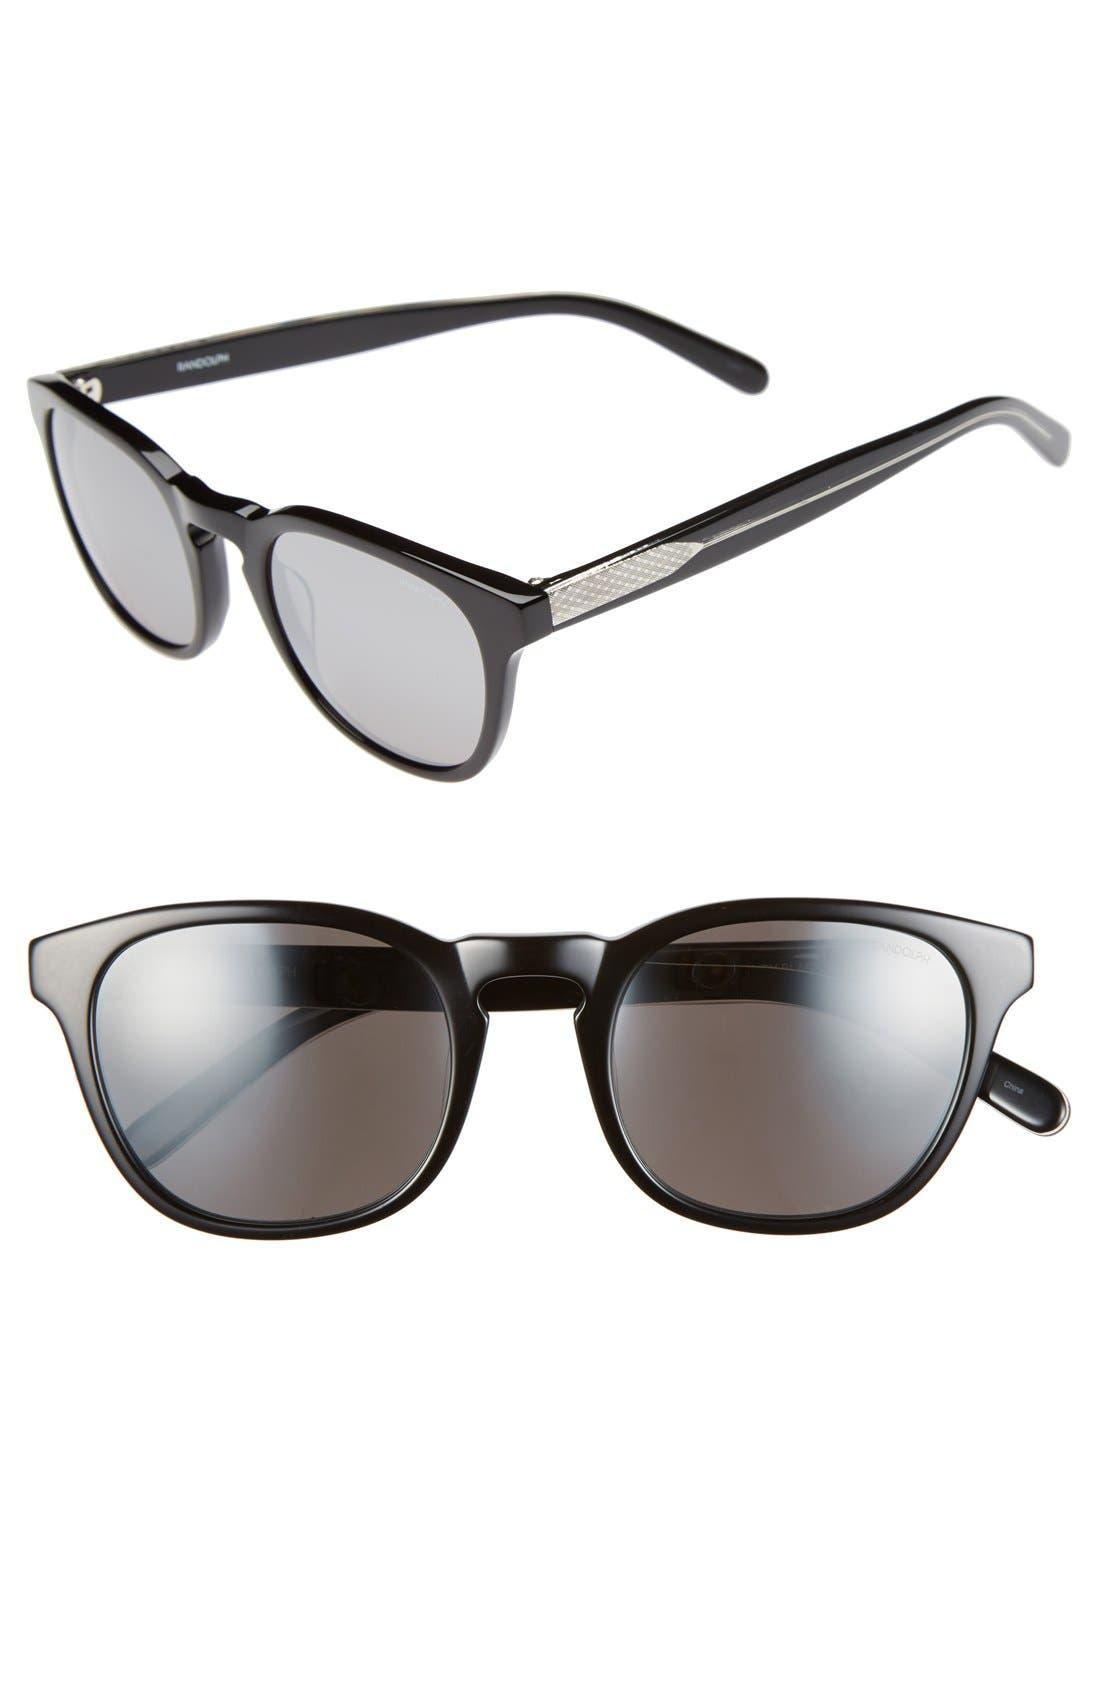 RANDOLPH ENGINEERING 'Ashby' 50mm Sunglasses, Main, color, 001